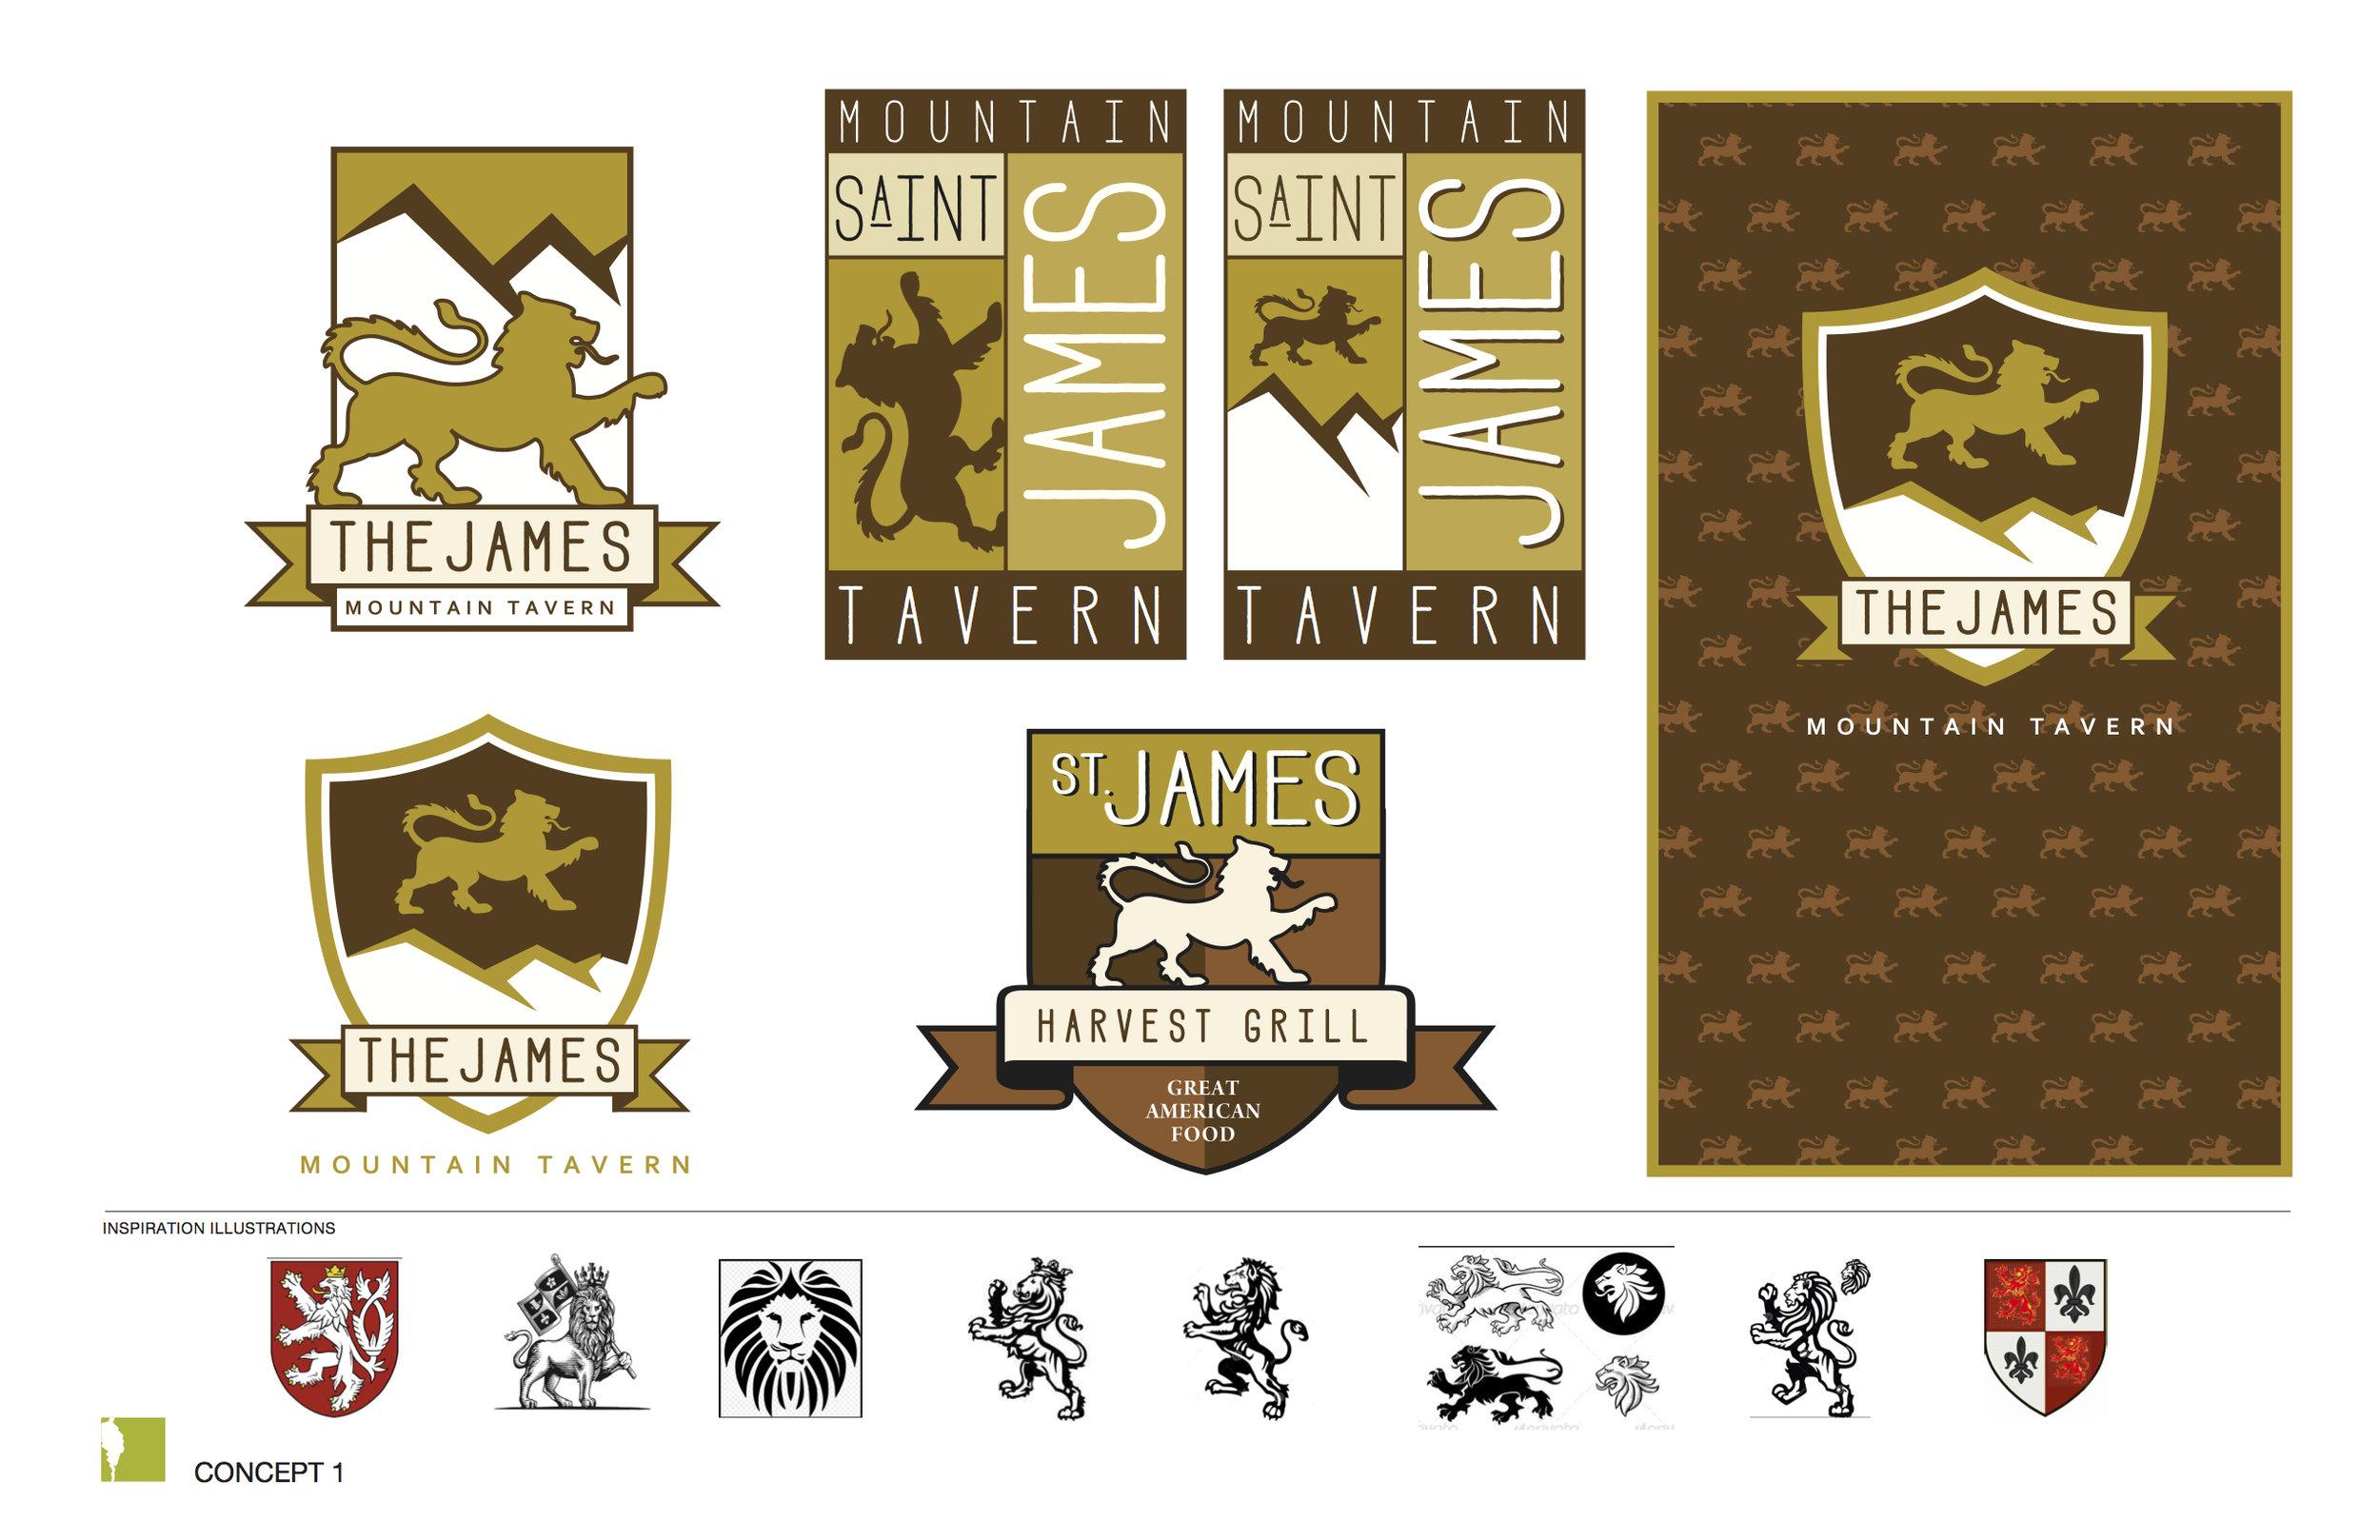 The JAMES Brand Presentation 020516.jpg